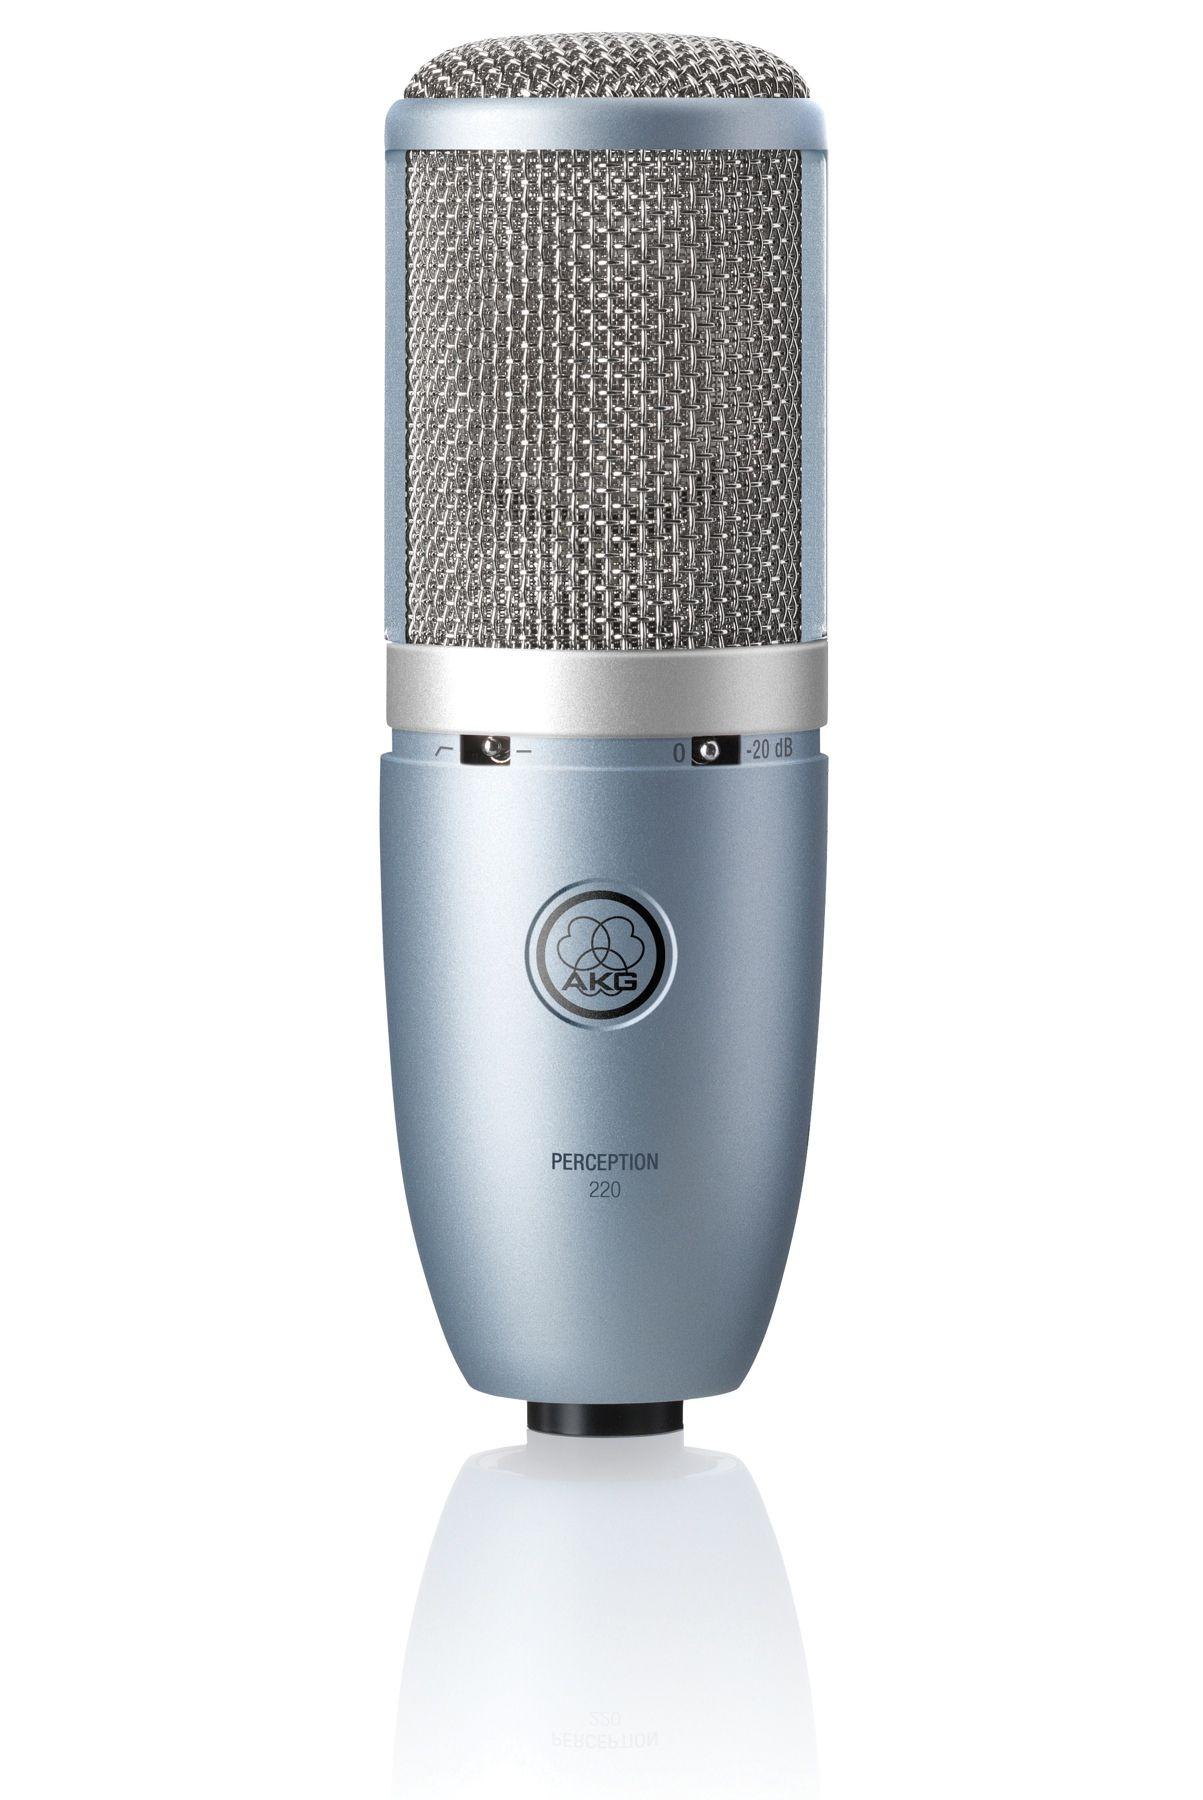 AKG P220 Large Diaphragm Condenser Microphone